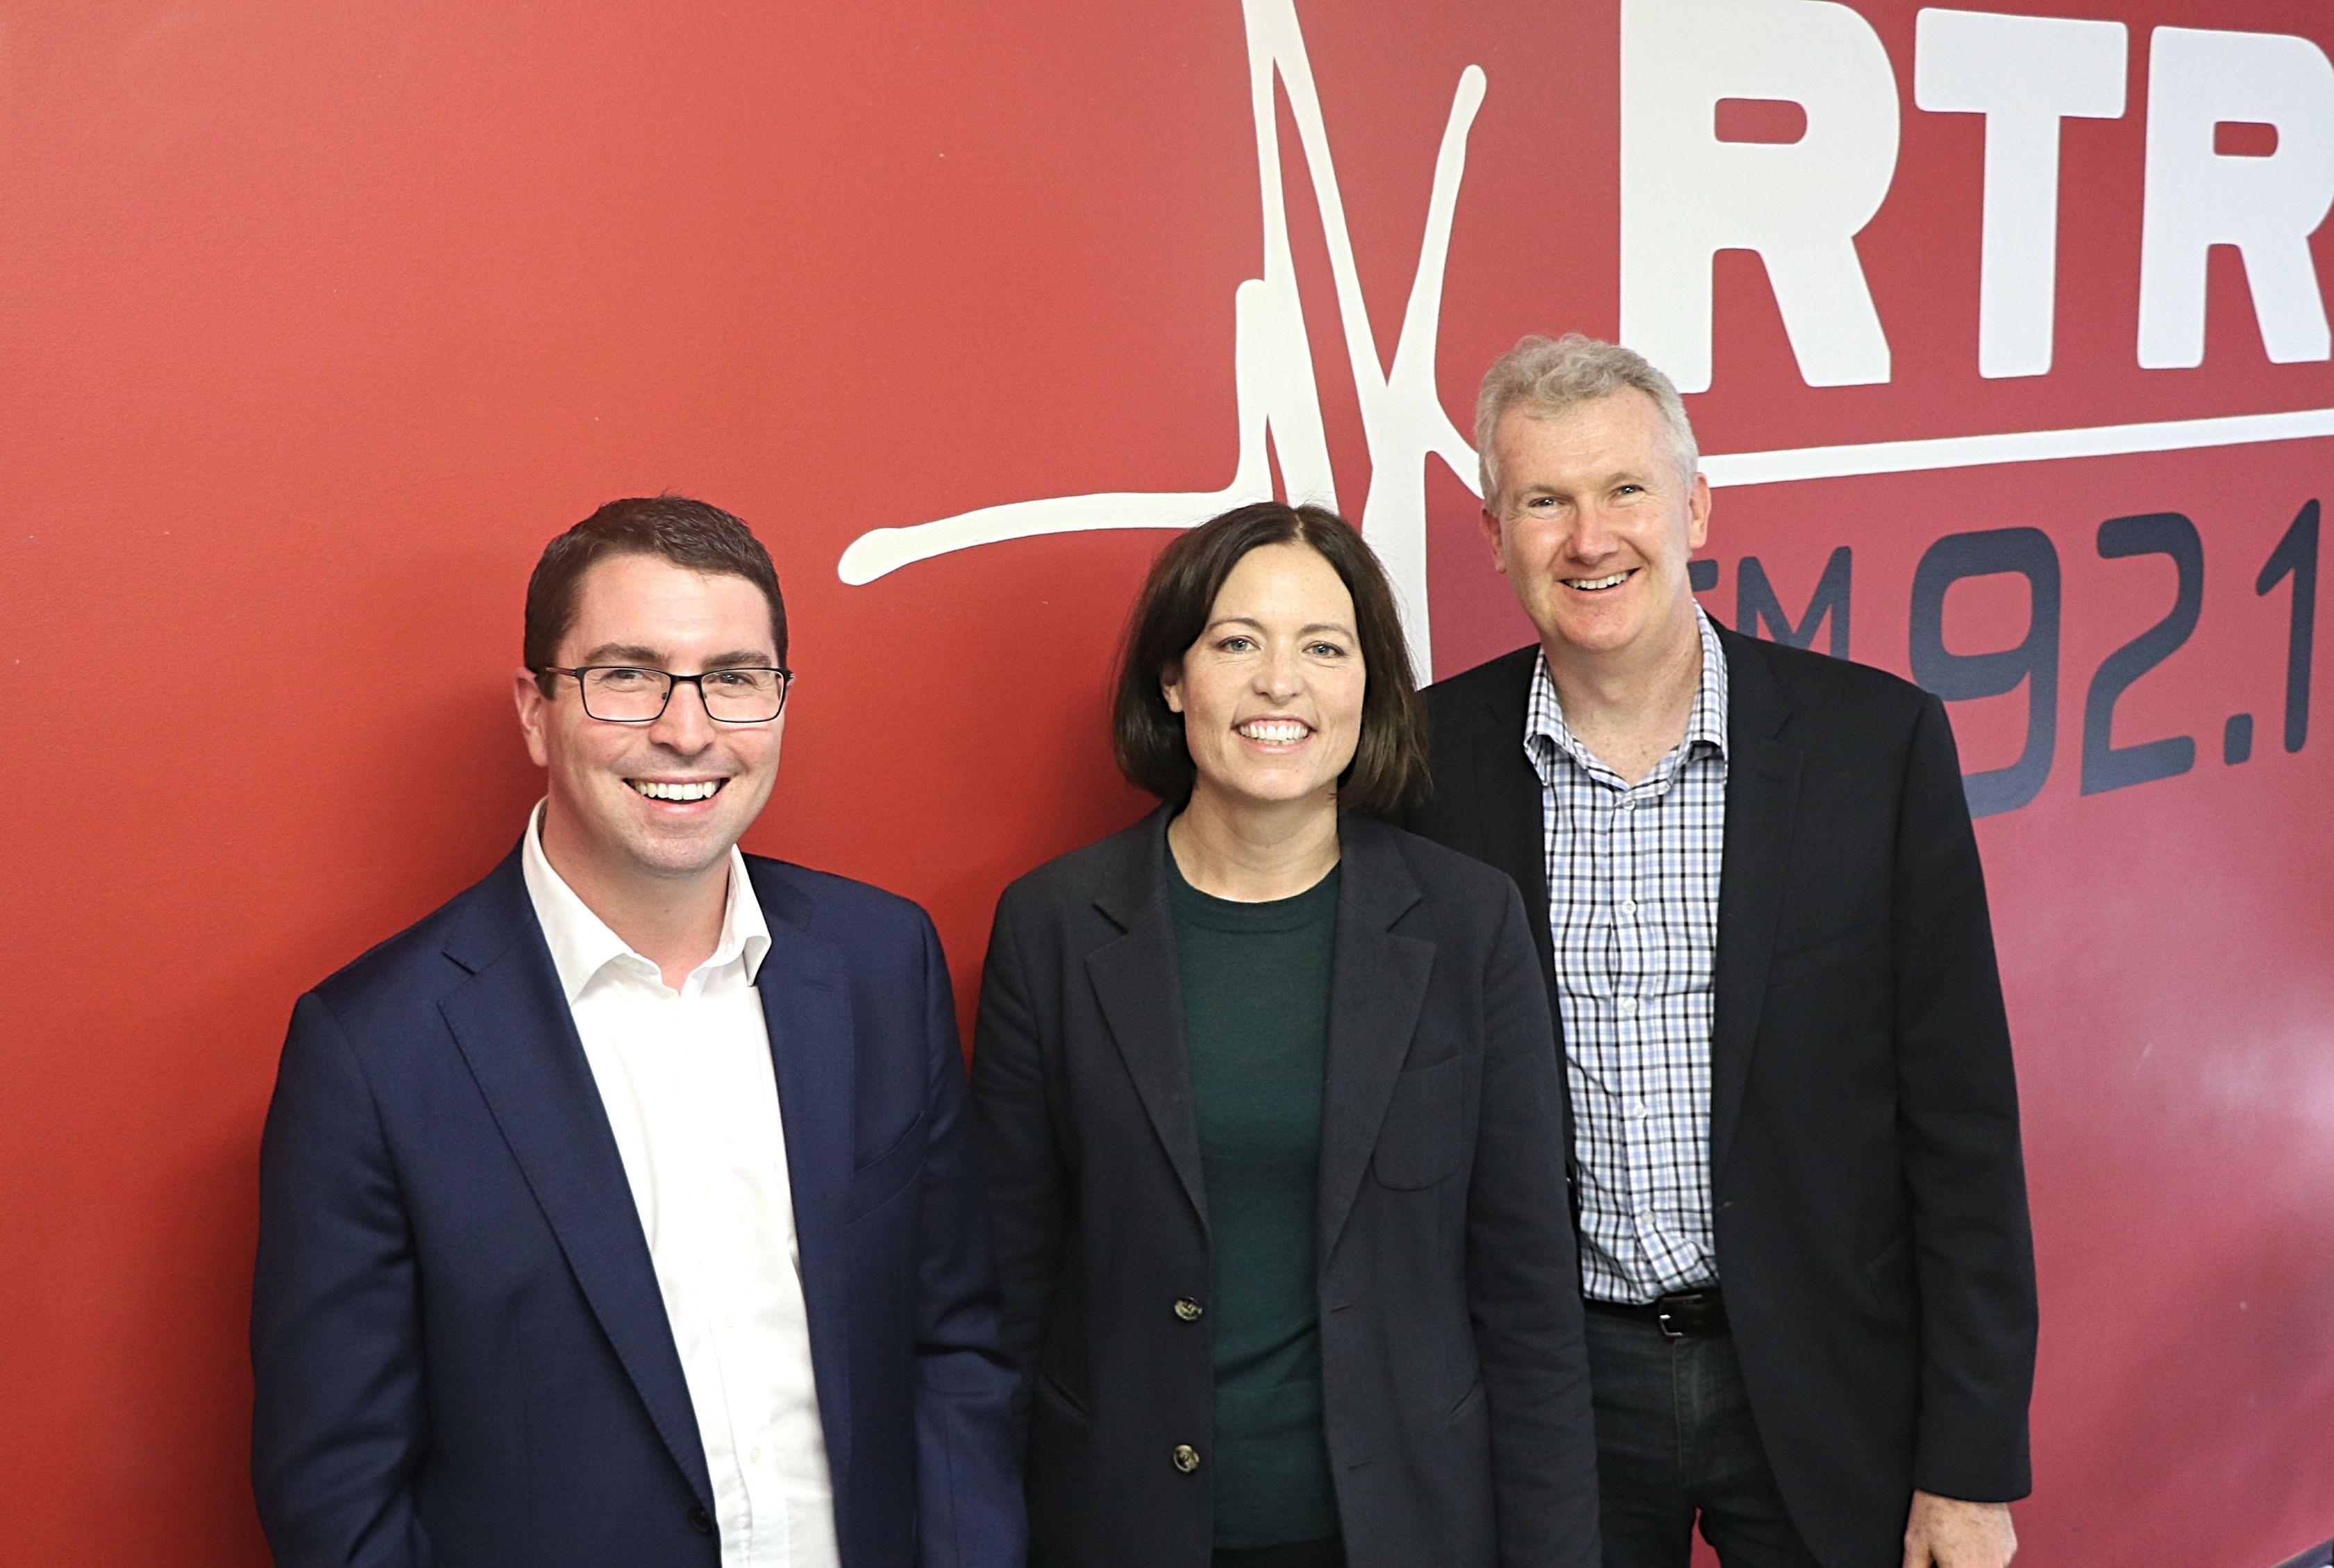 Patrick Gorman, Tony Burke and Karen Lee RTR FM